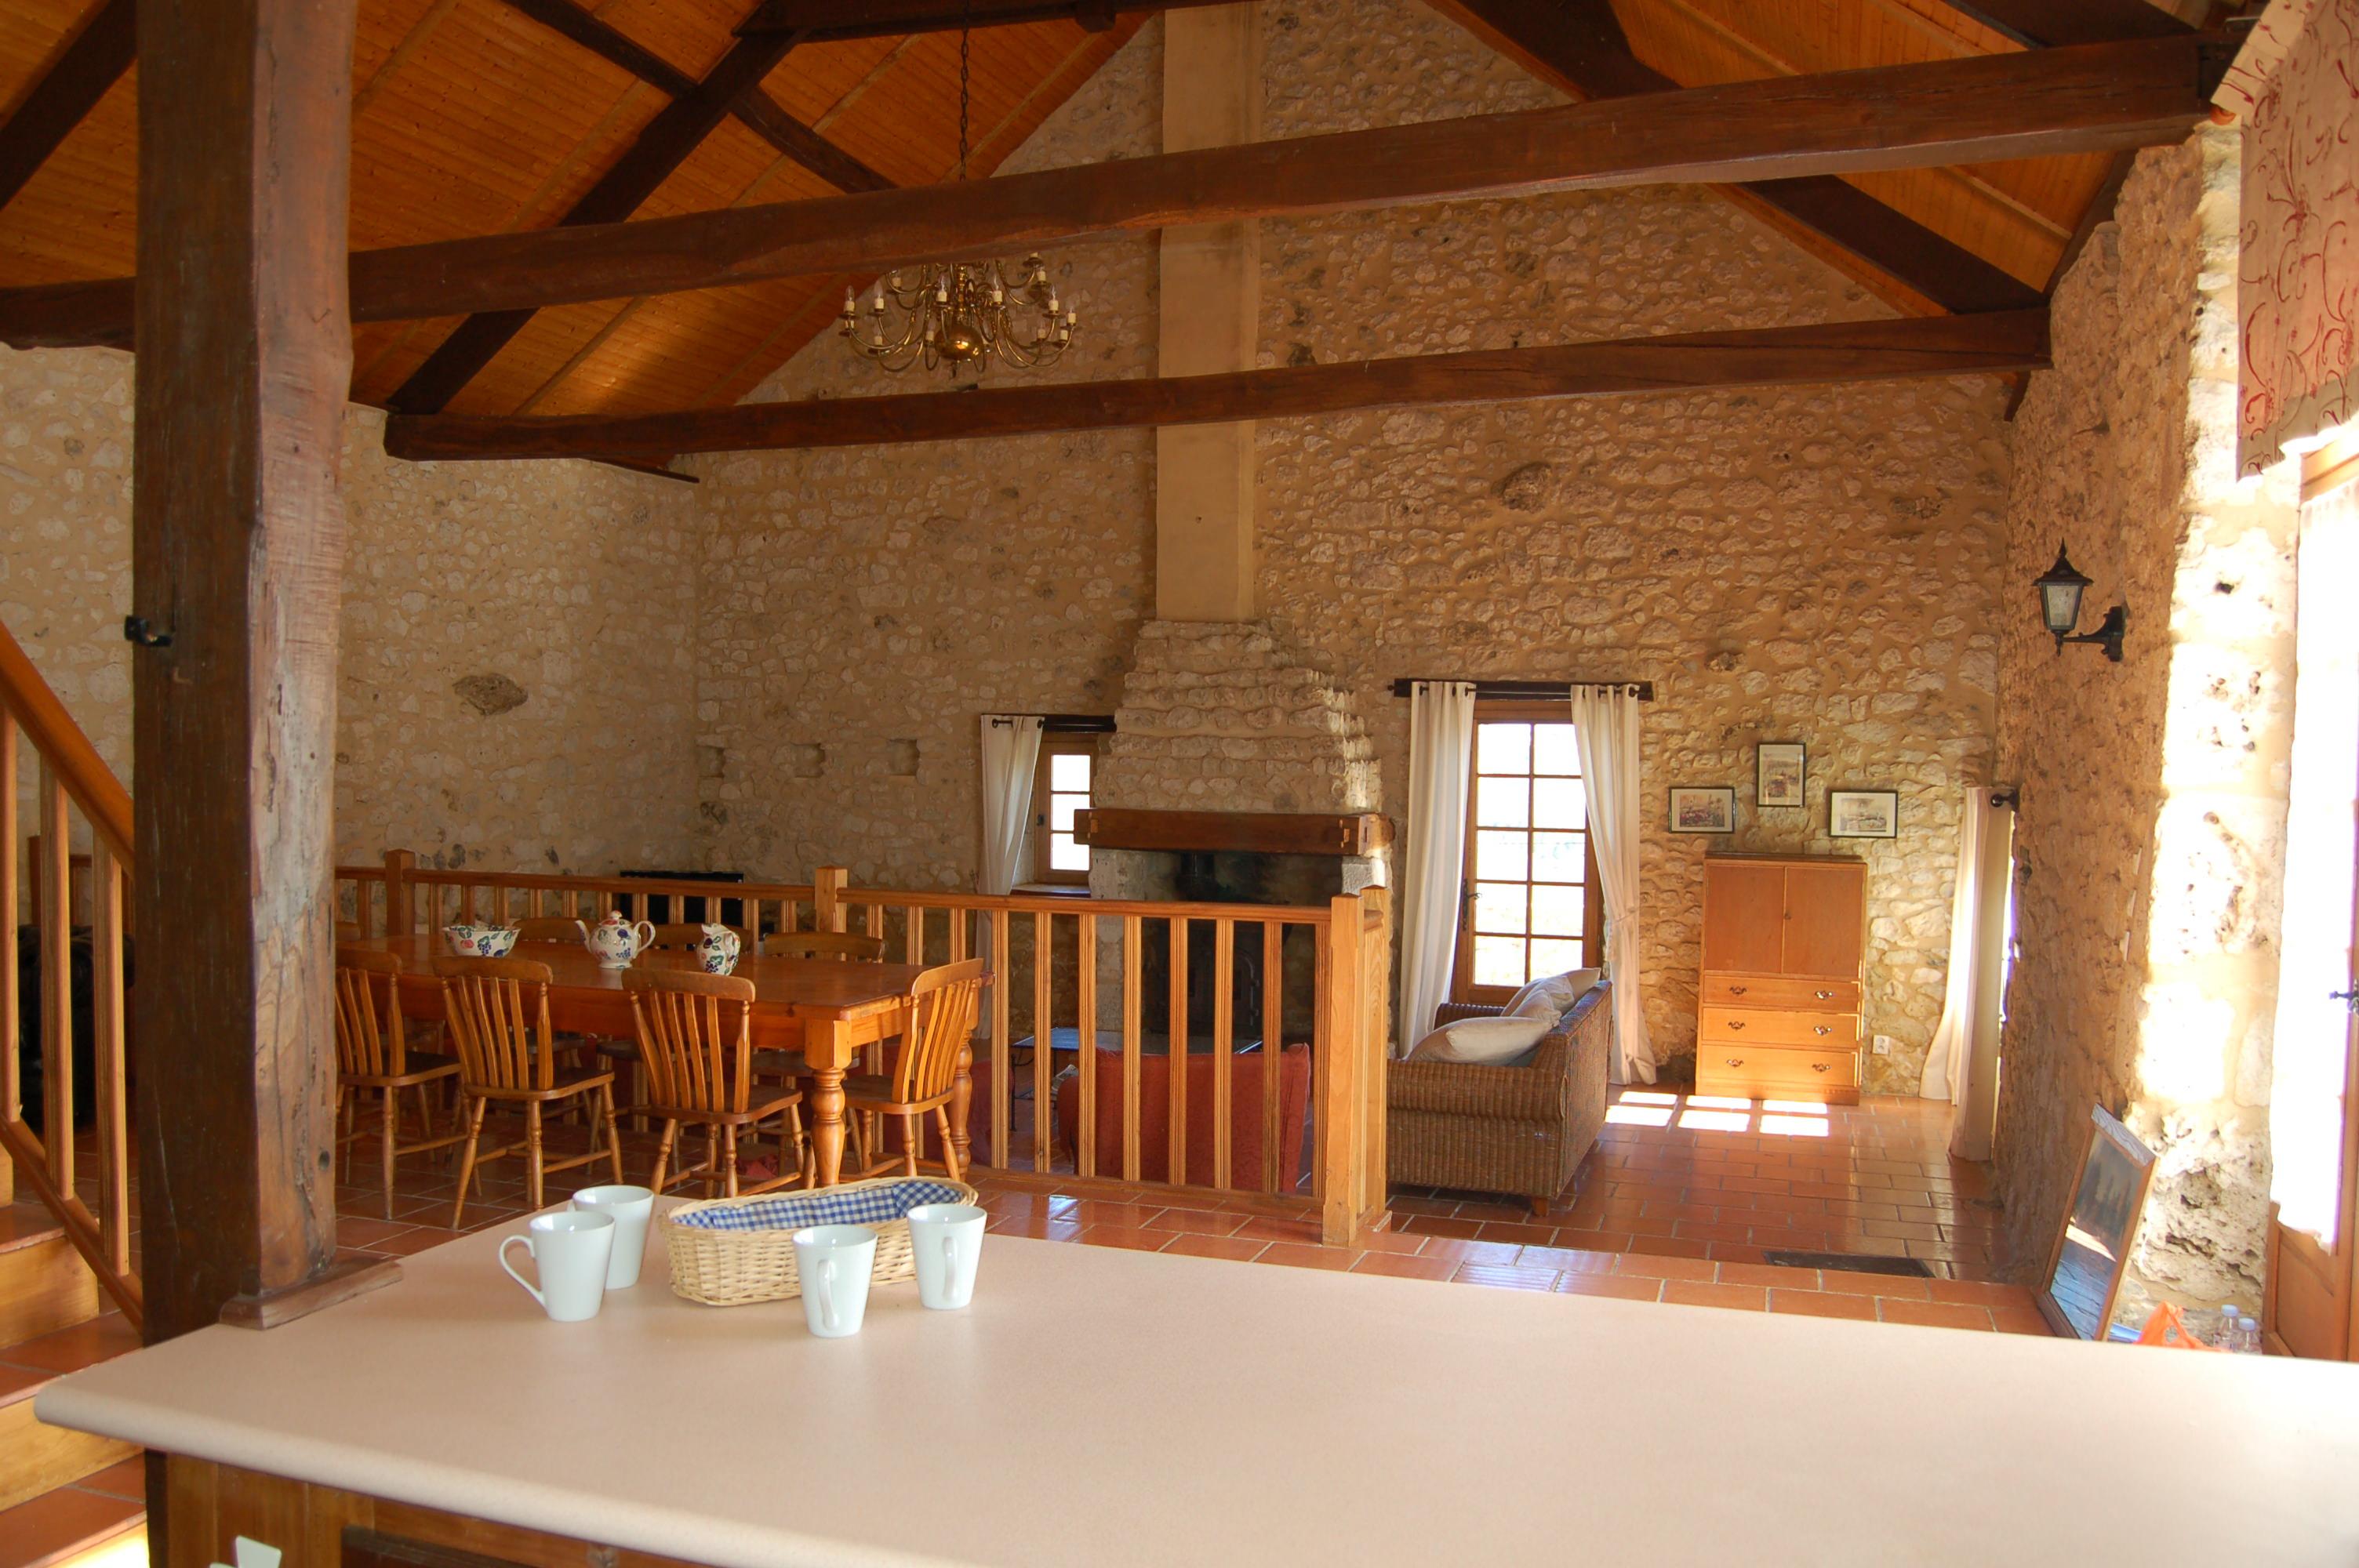 Stylish and elegant gite accommodation dordogne Barn conversion interior design ideas